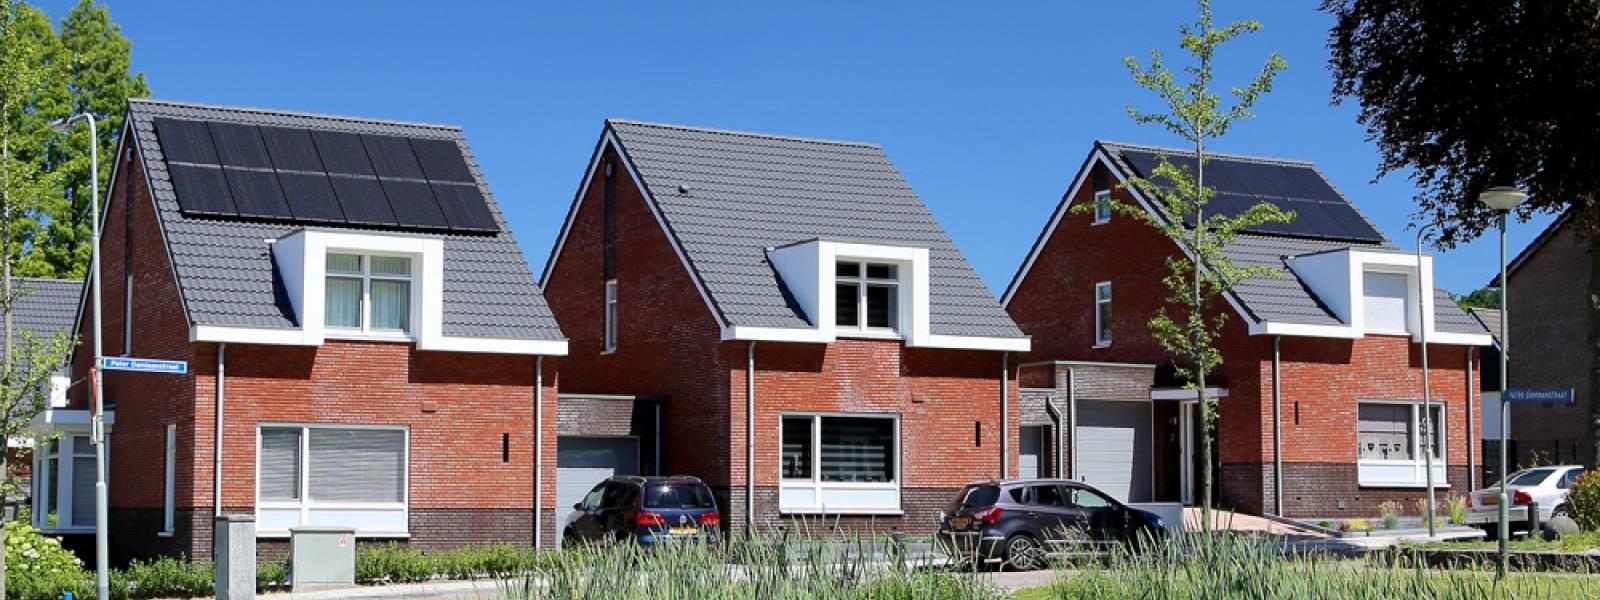 Vendita Case In Olanda quando affittate una casa in olanda